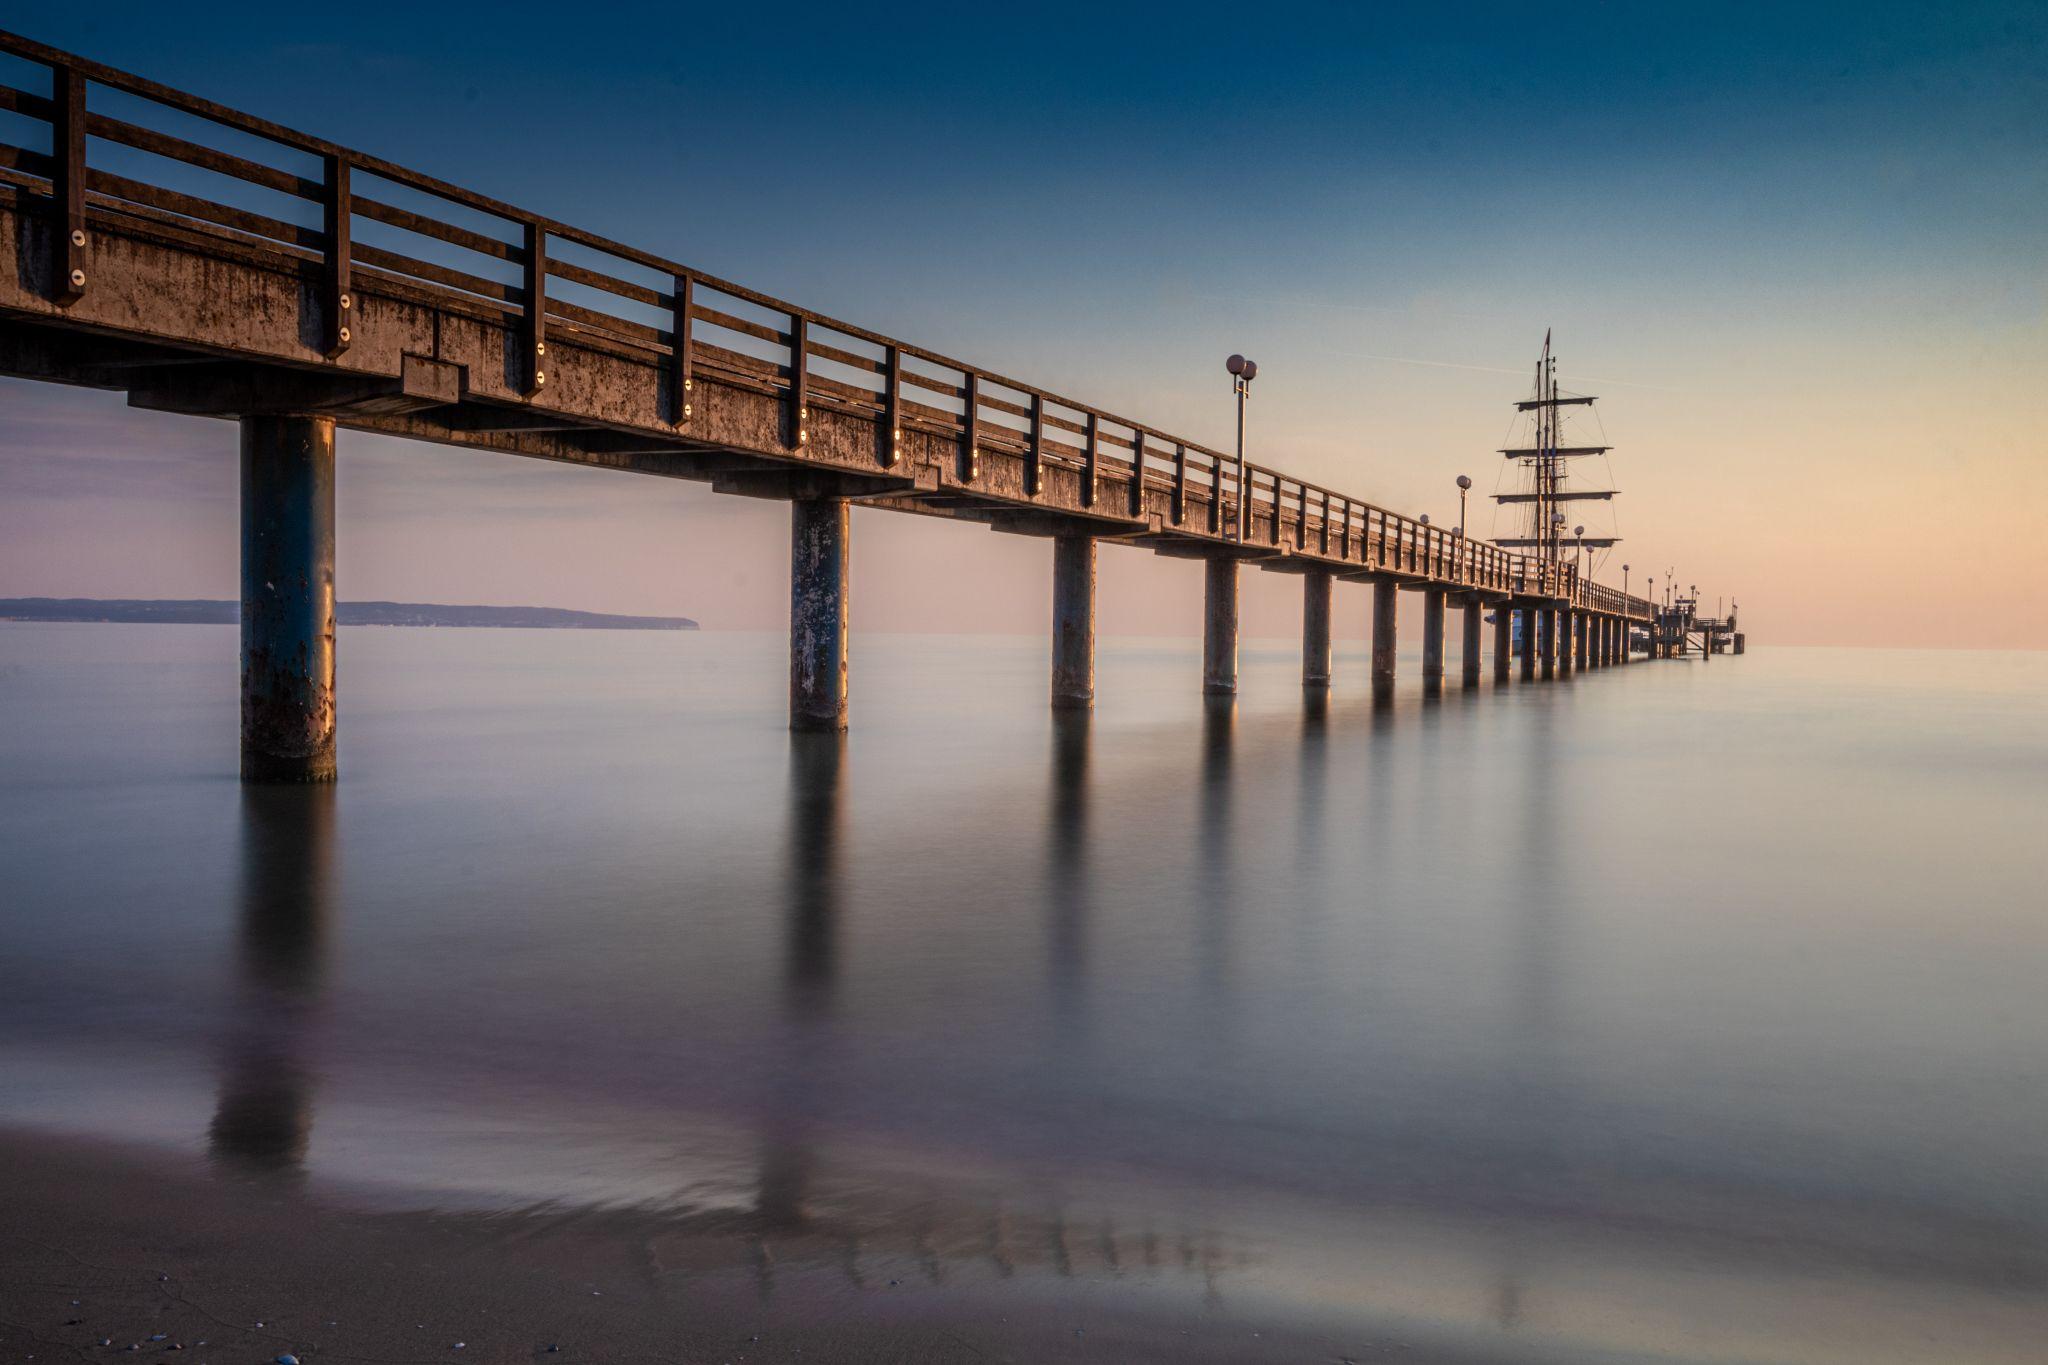 Binzer Pier, Germany